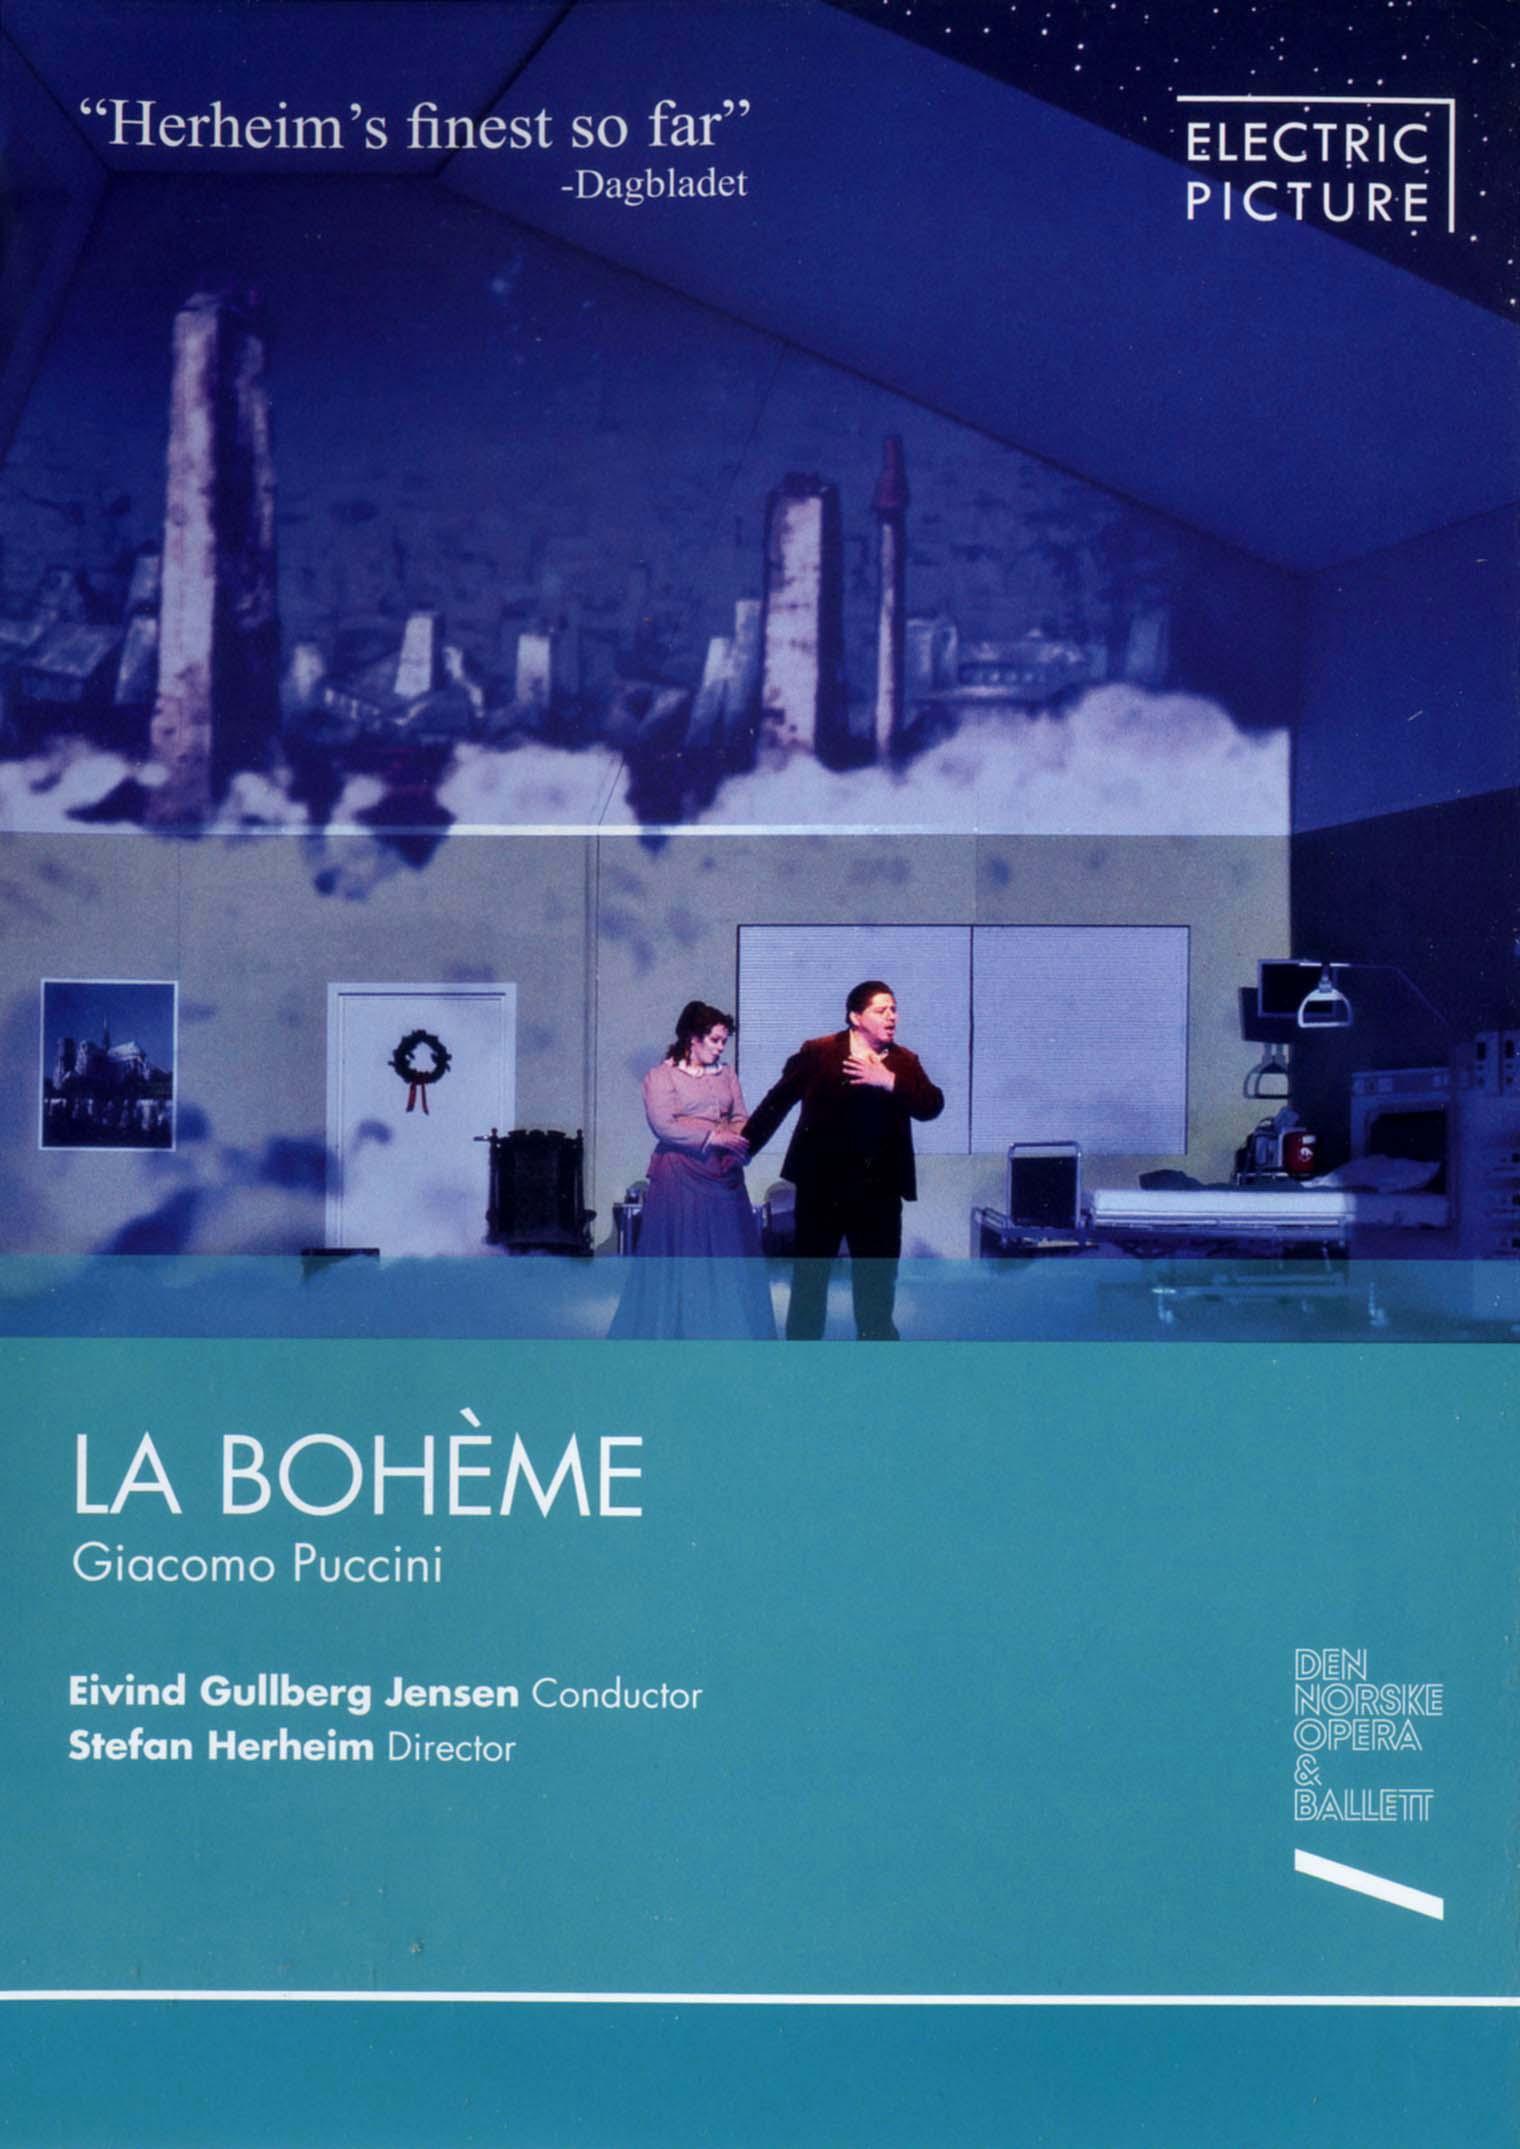 La Boheme (Den Norske Opera & Ballett)